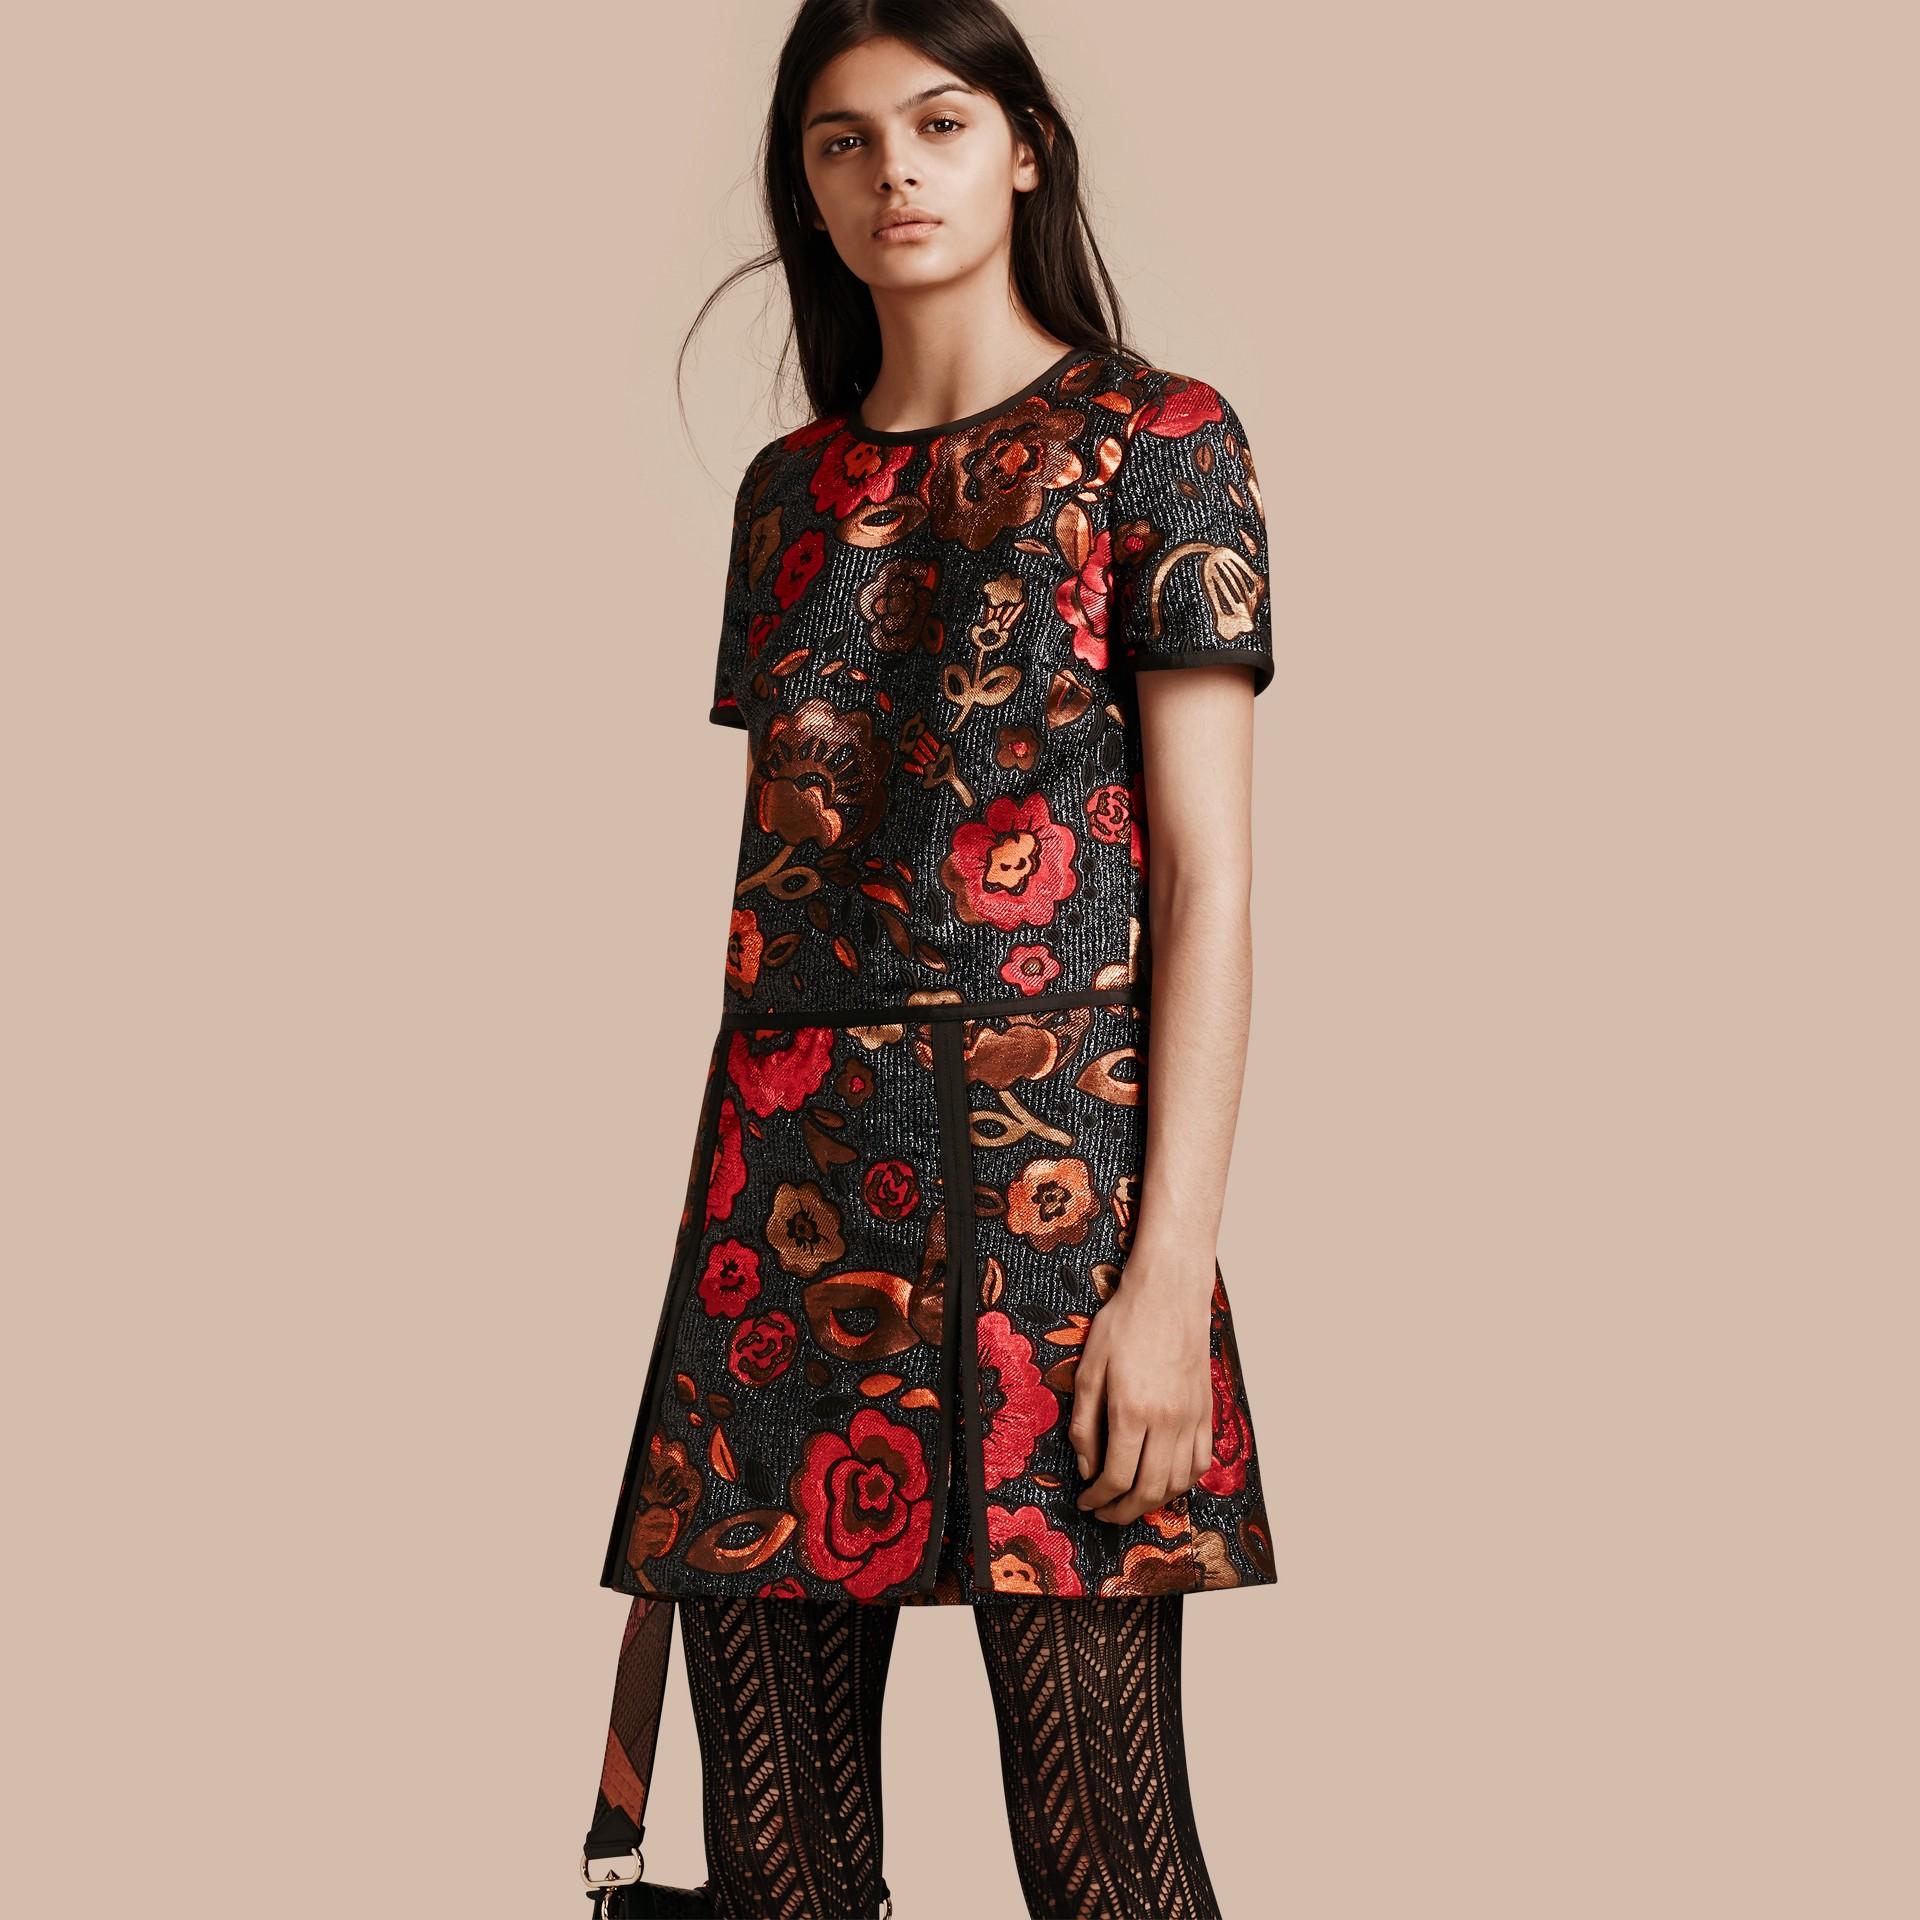 Navy Floral Jacquard T-shirt Dress - gallery image 1